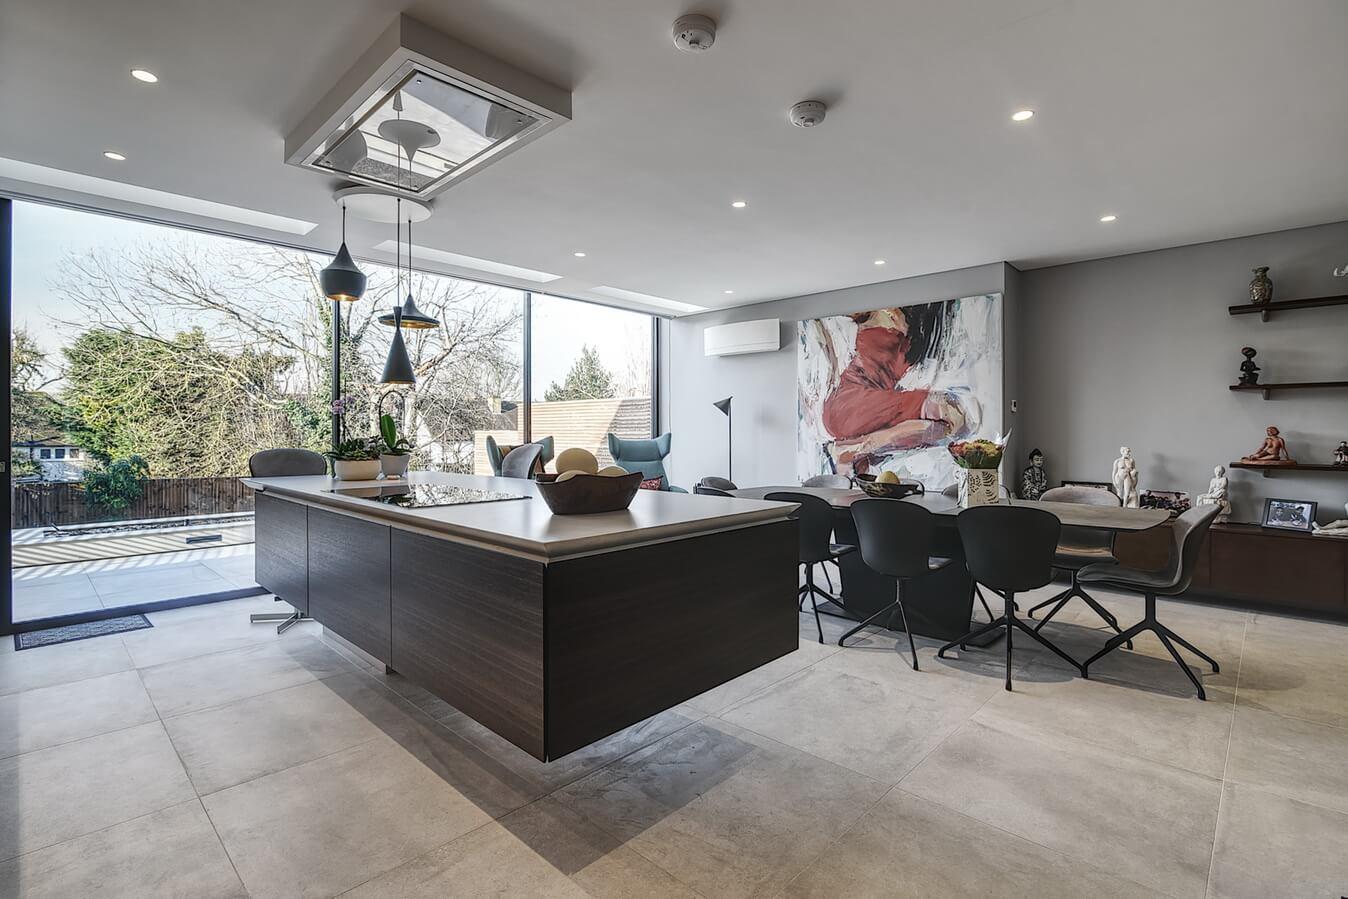 Warendorf-floating-kitchen-island-london.jpg